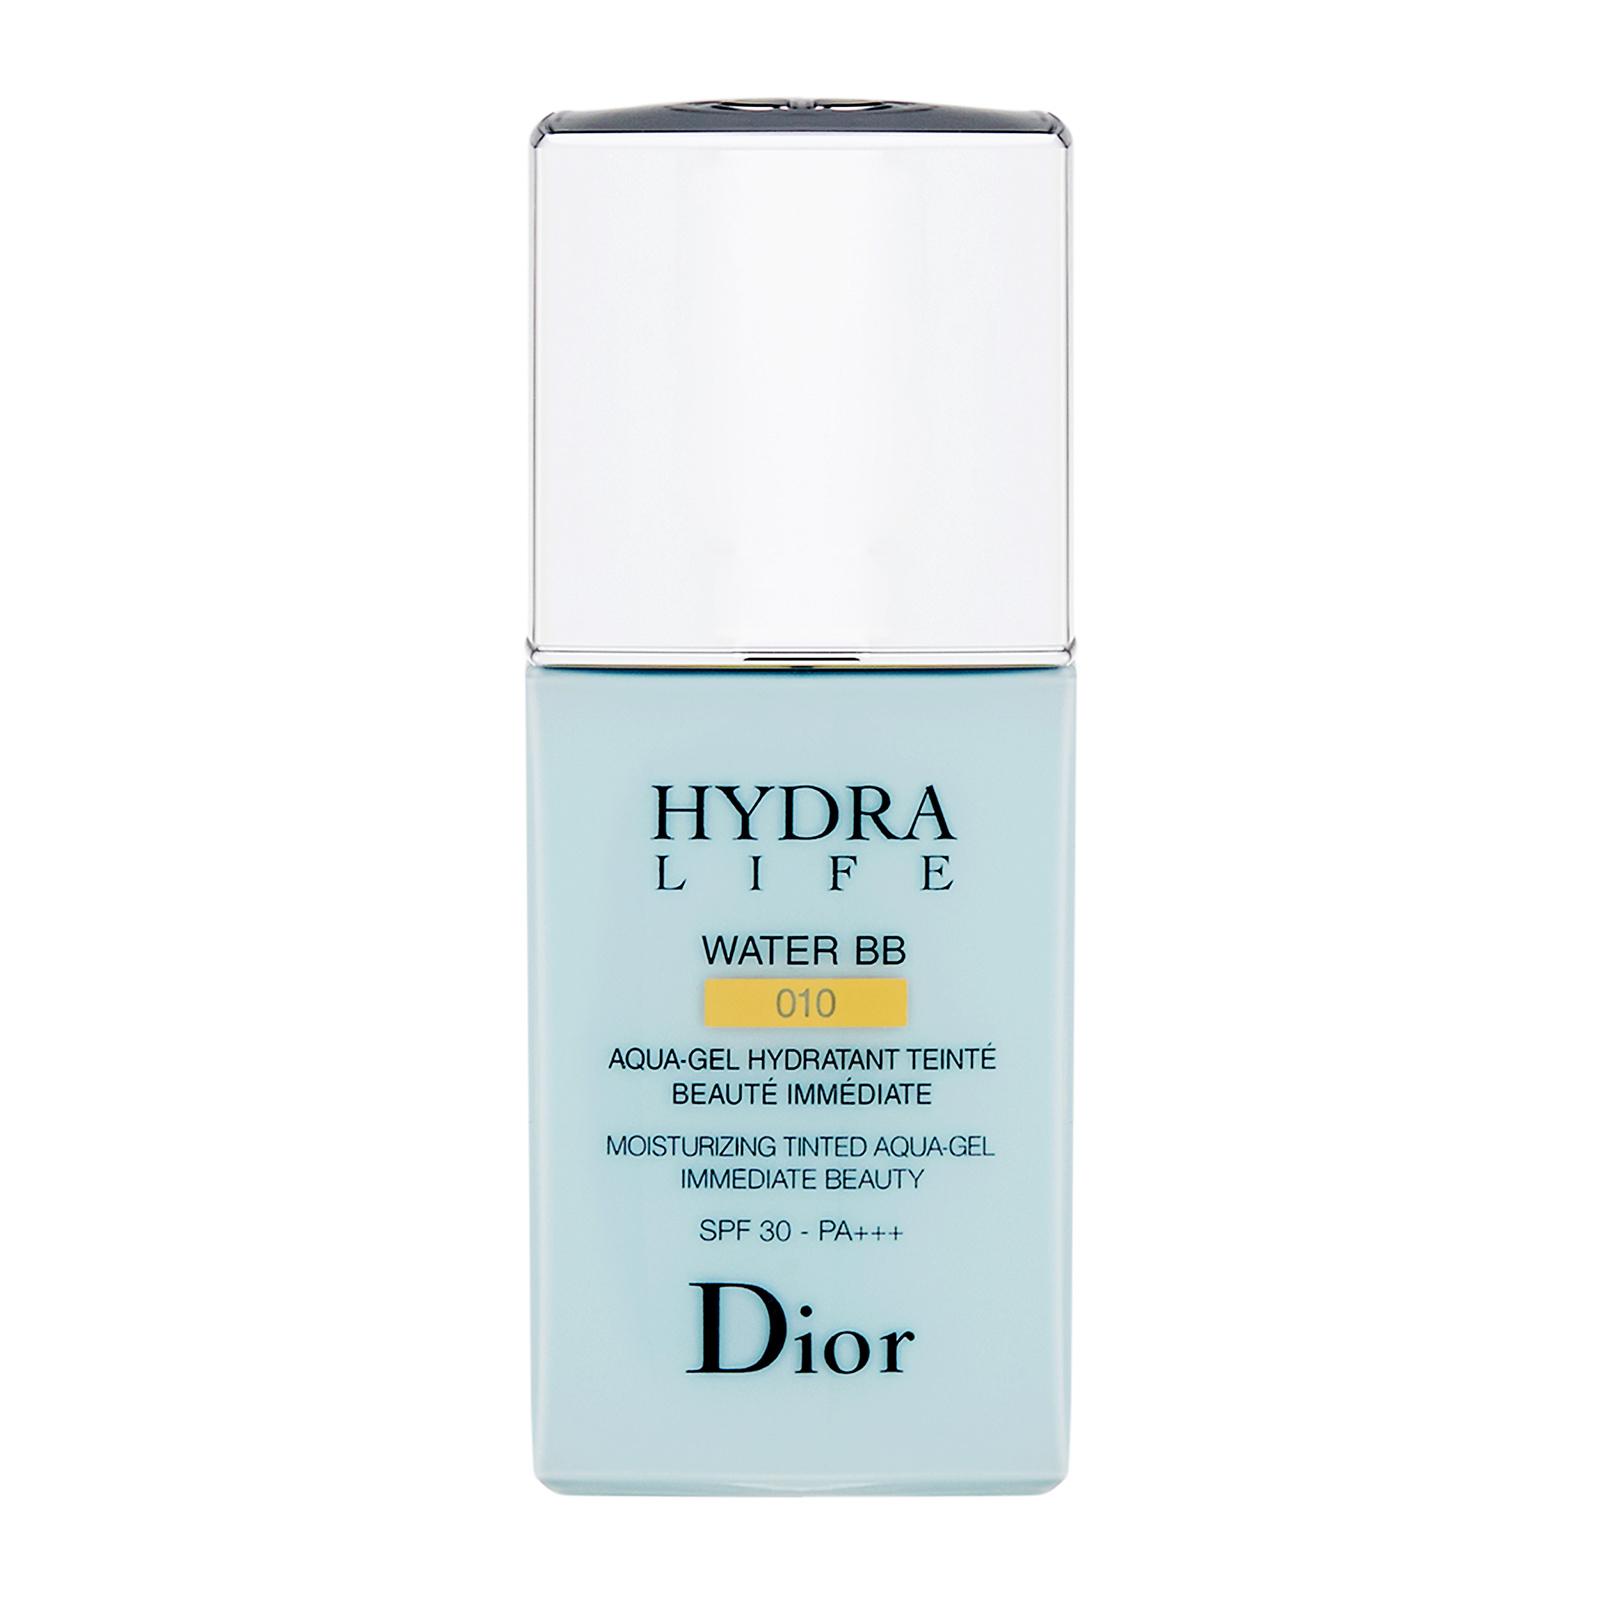 Christian Dior Hydra Life Moisturizing Tinted Aqua-Gel Immediate Beauty Water BB SPF30 / PA+++ 010, 1oz, 30ml